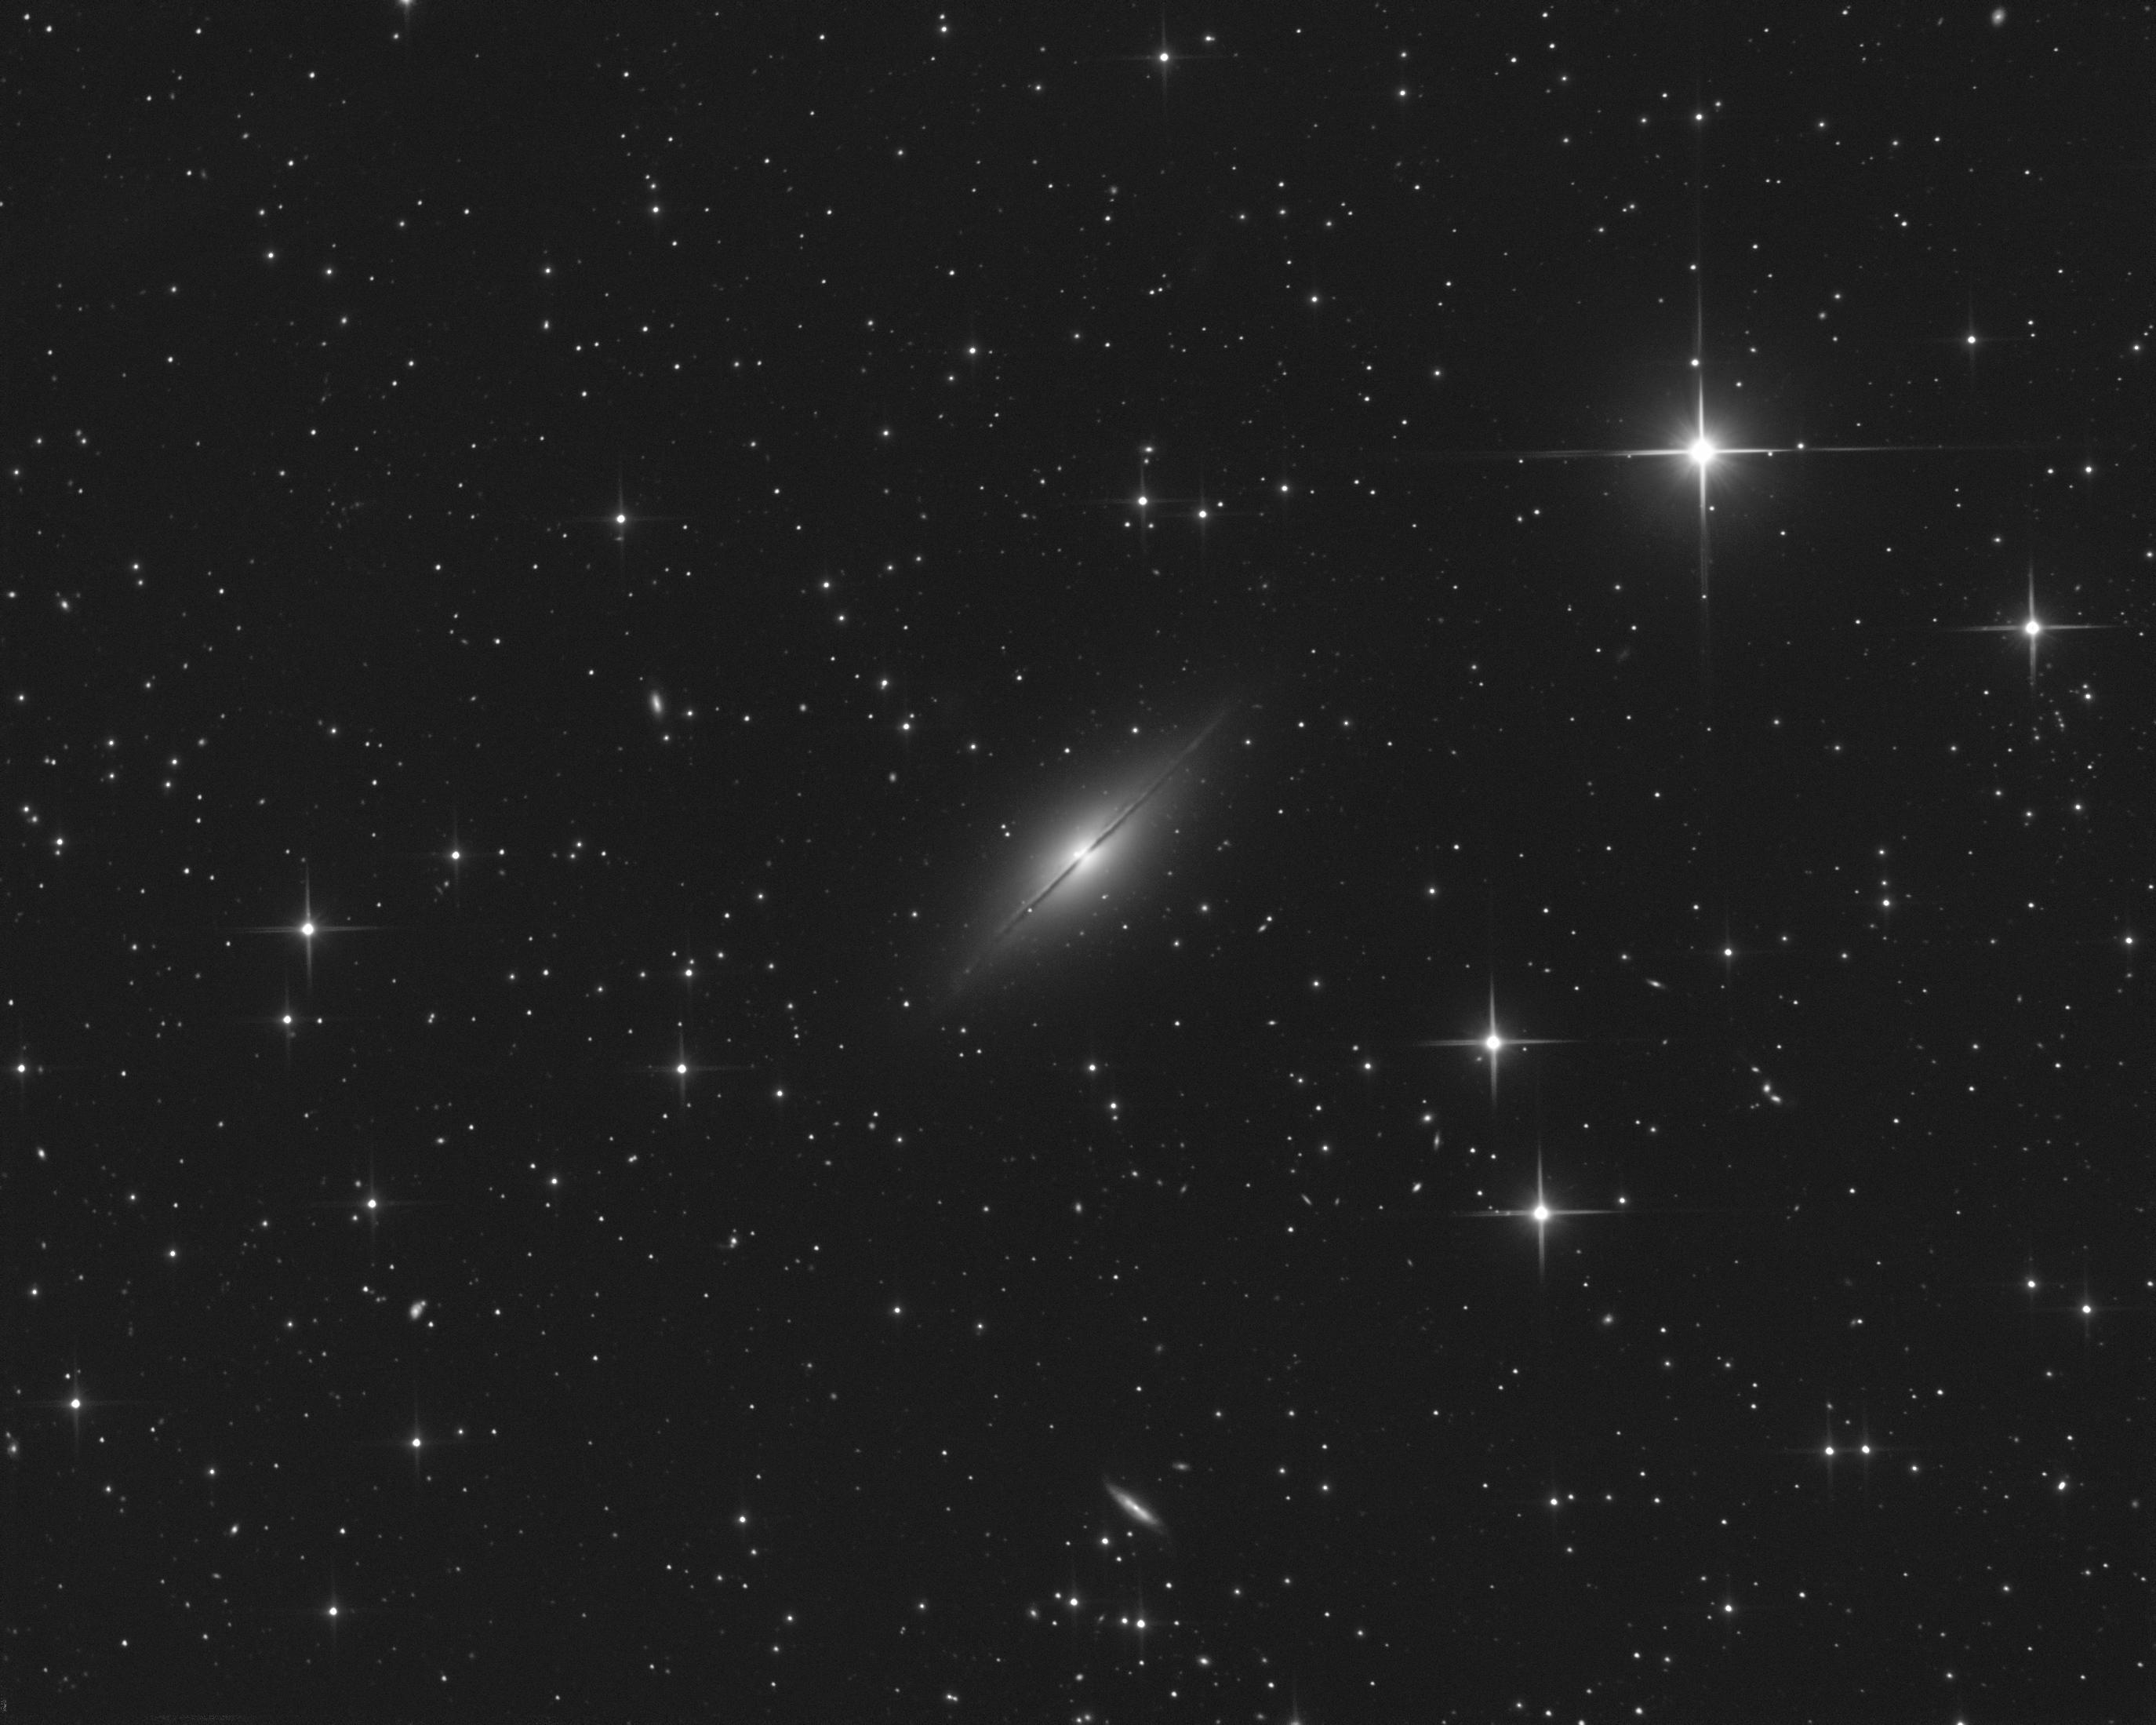 Supernova 2021rhu dans la galaxie NGC7814 Ngc7814v2